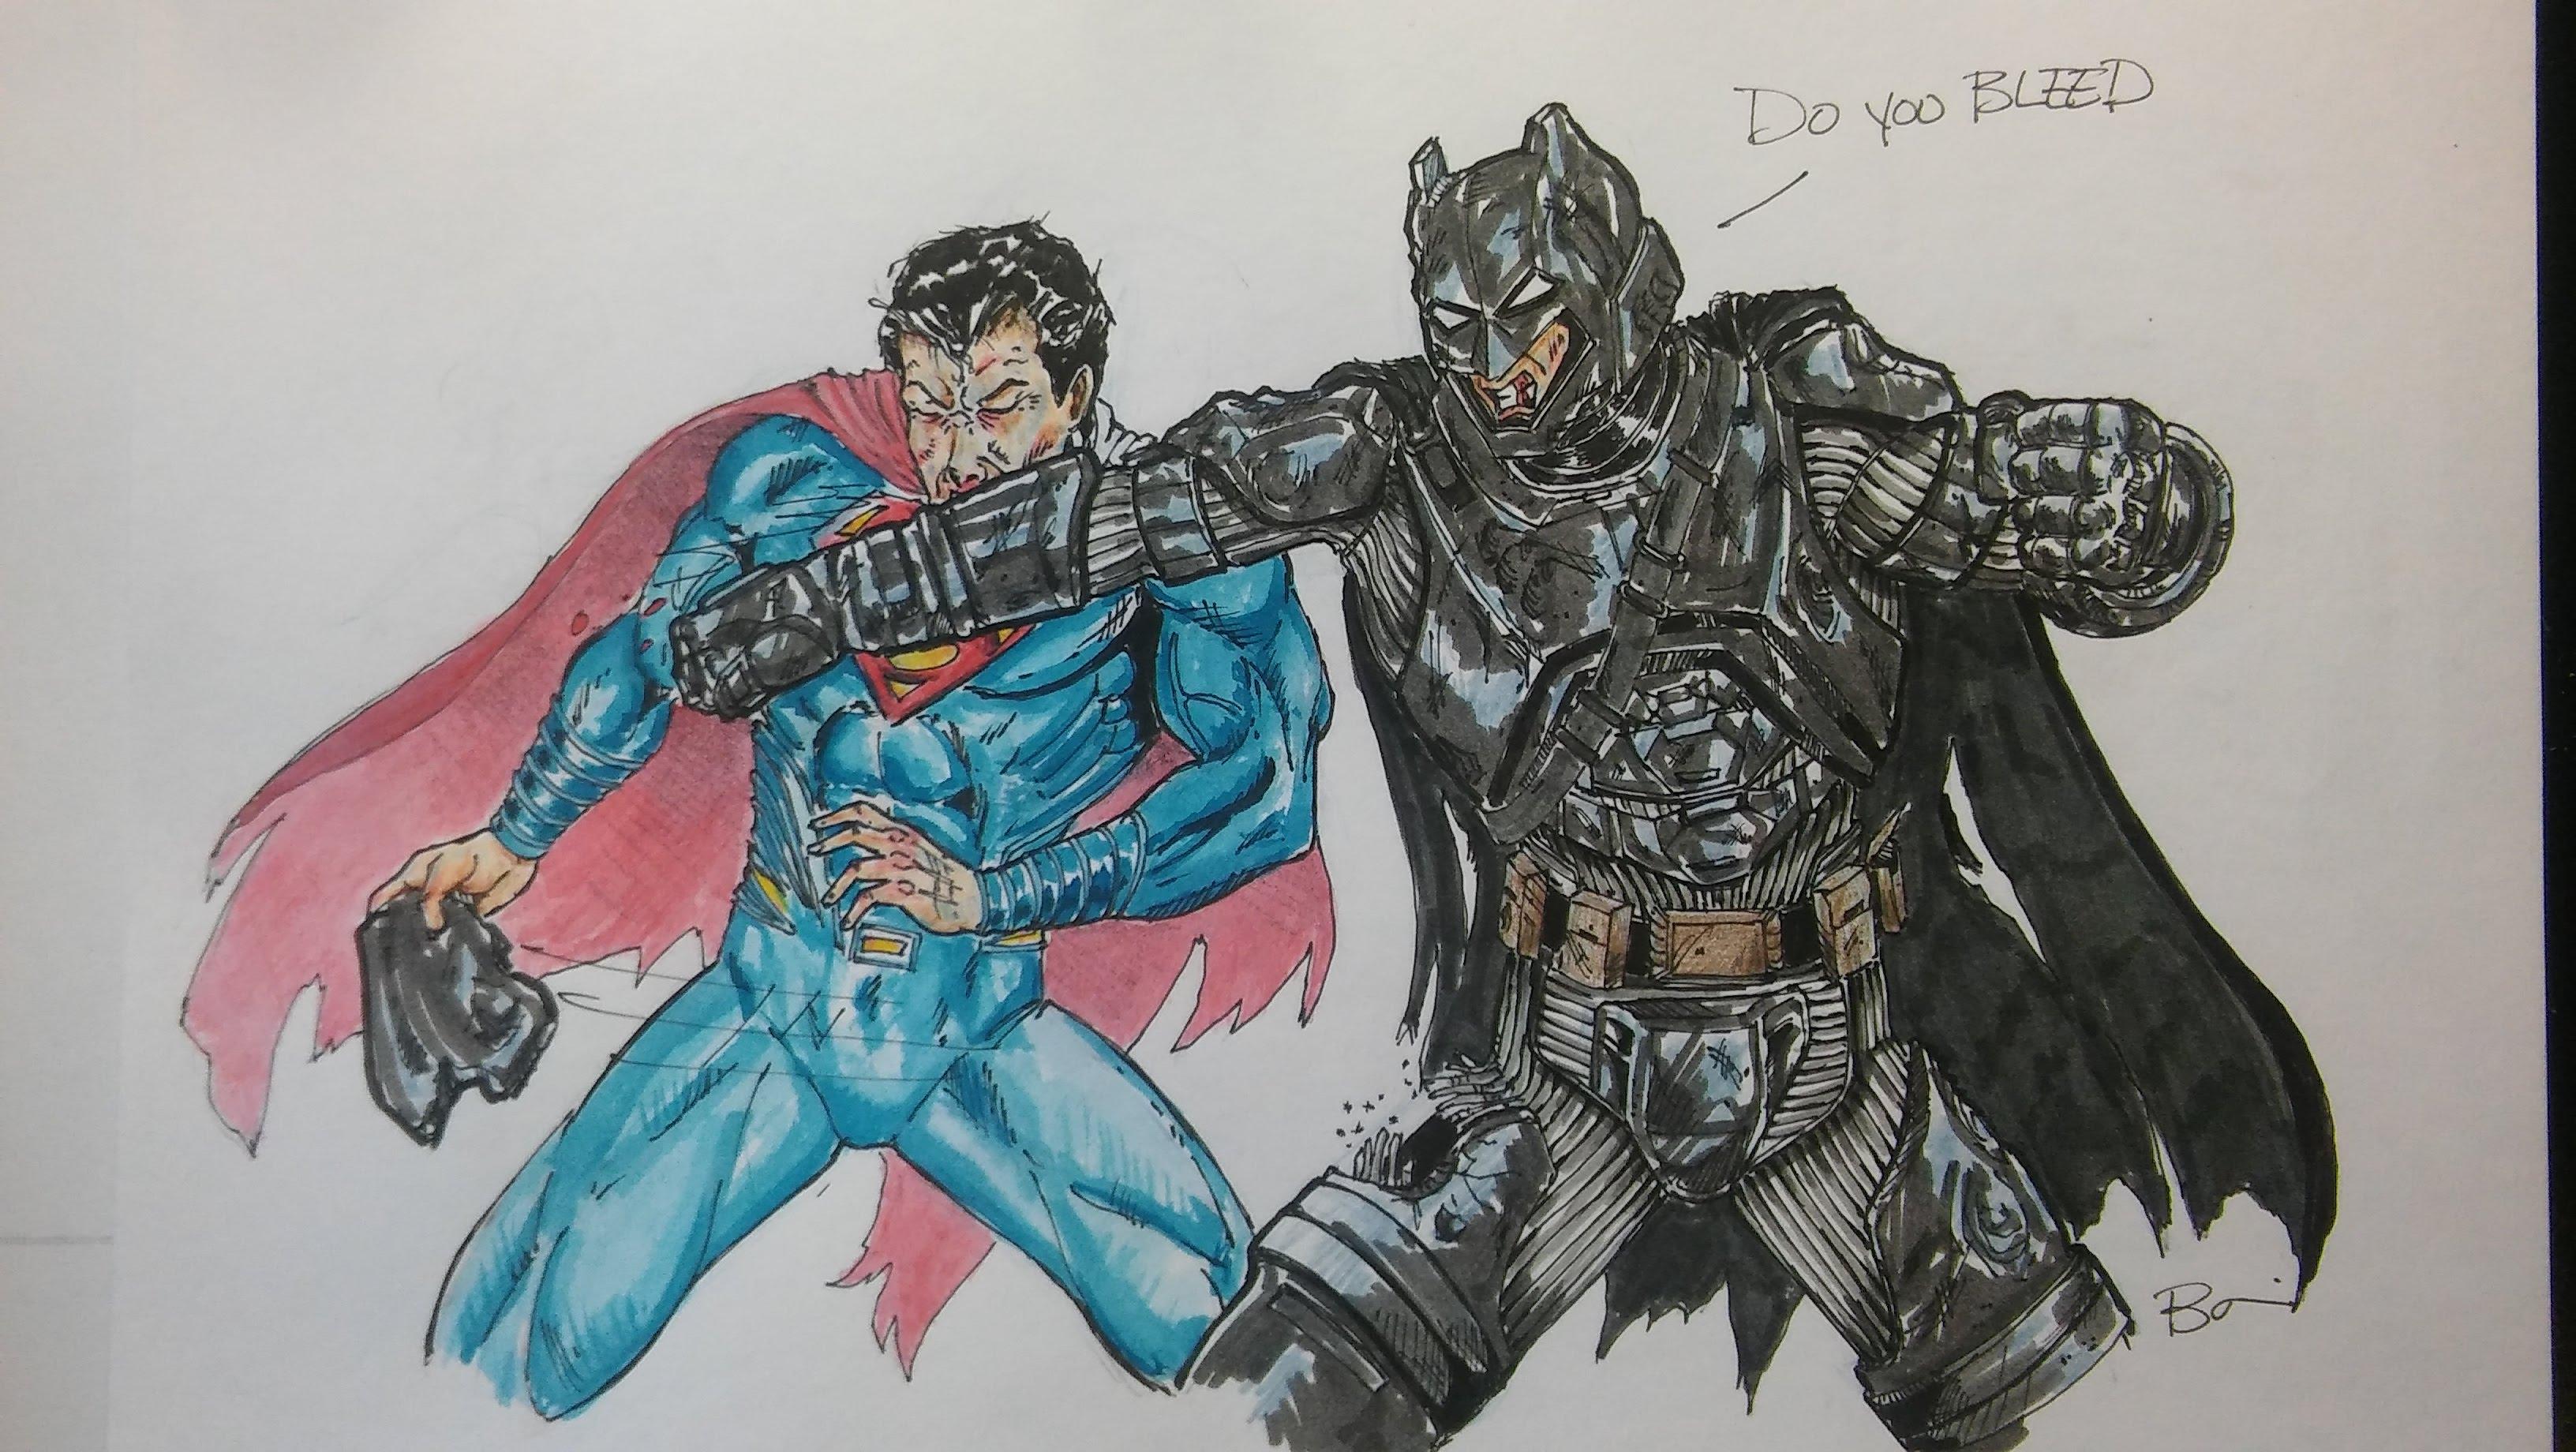 3264x1840 Batman Vs Superman Speed Drawing Dawn Of Justice The Battle